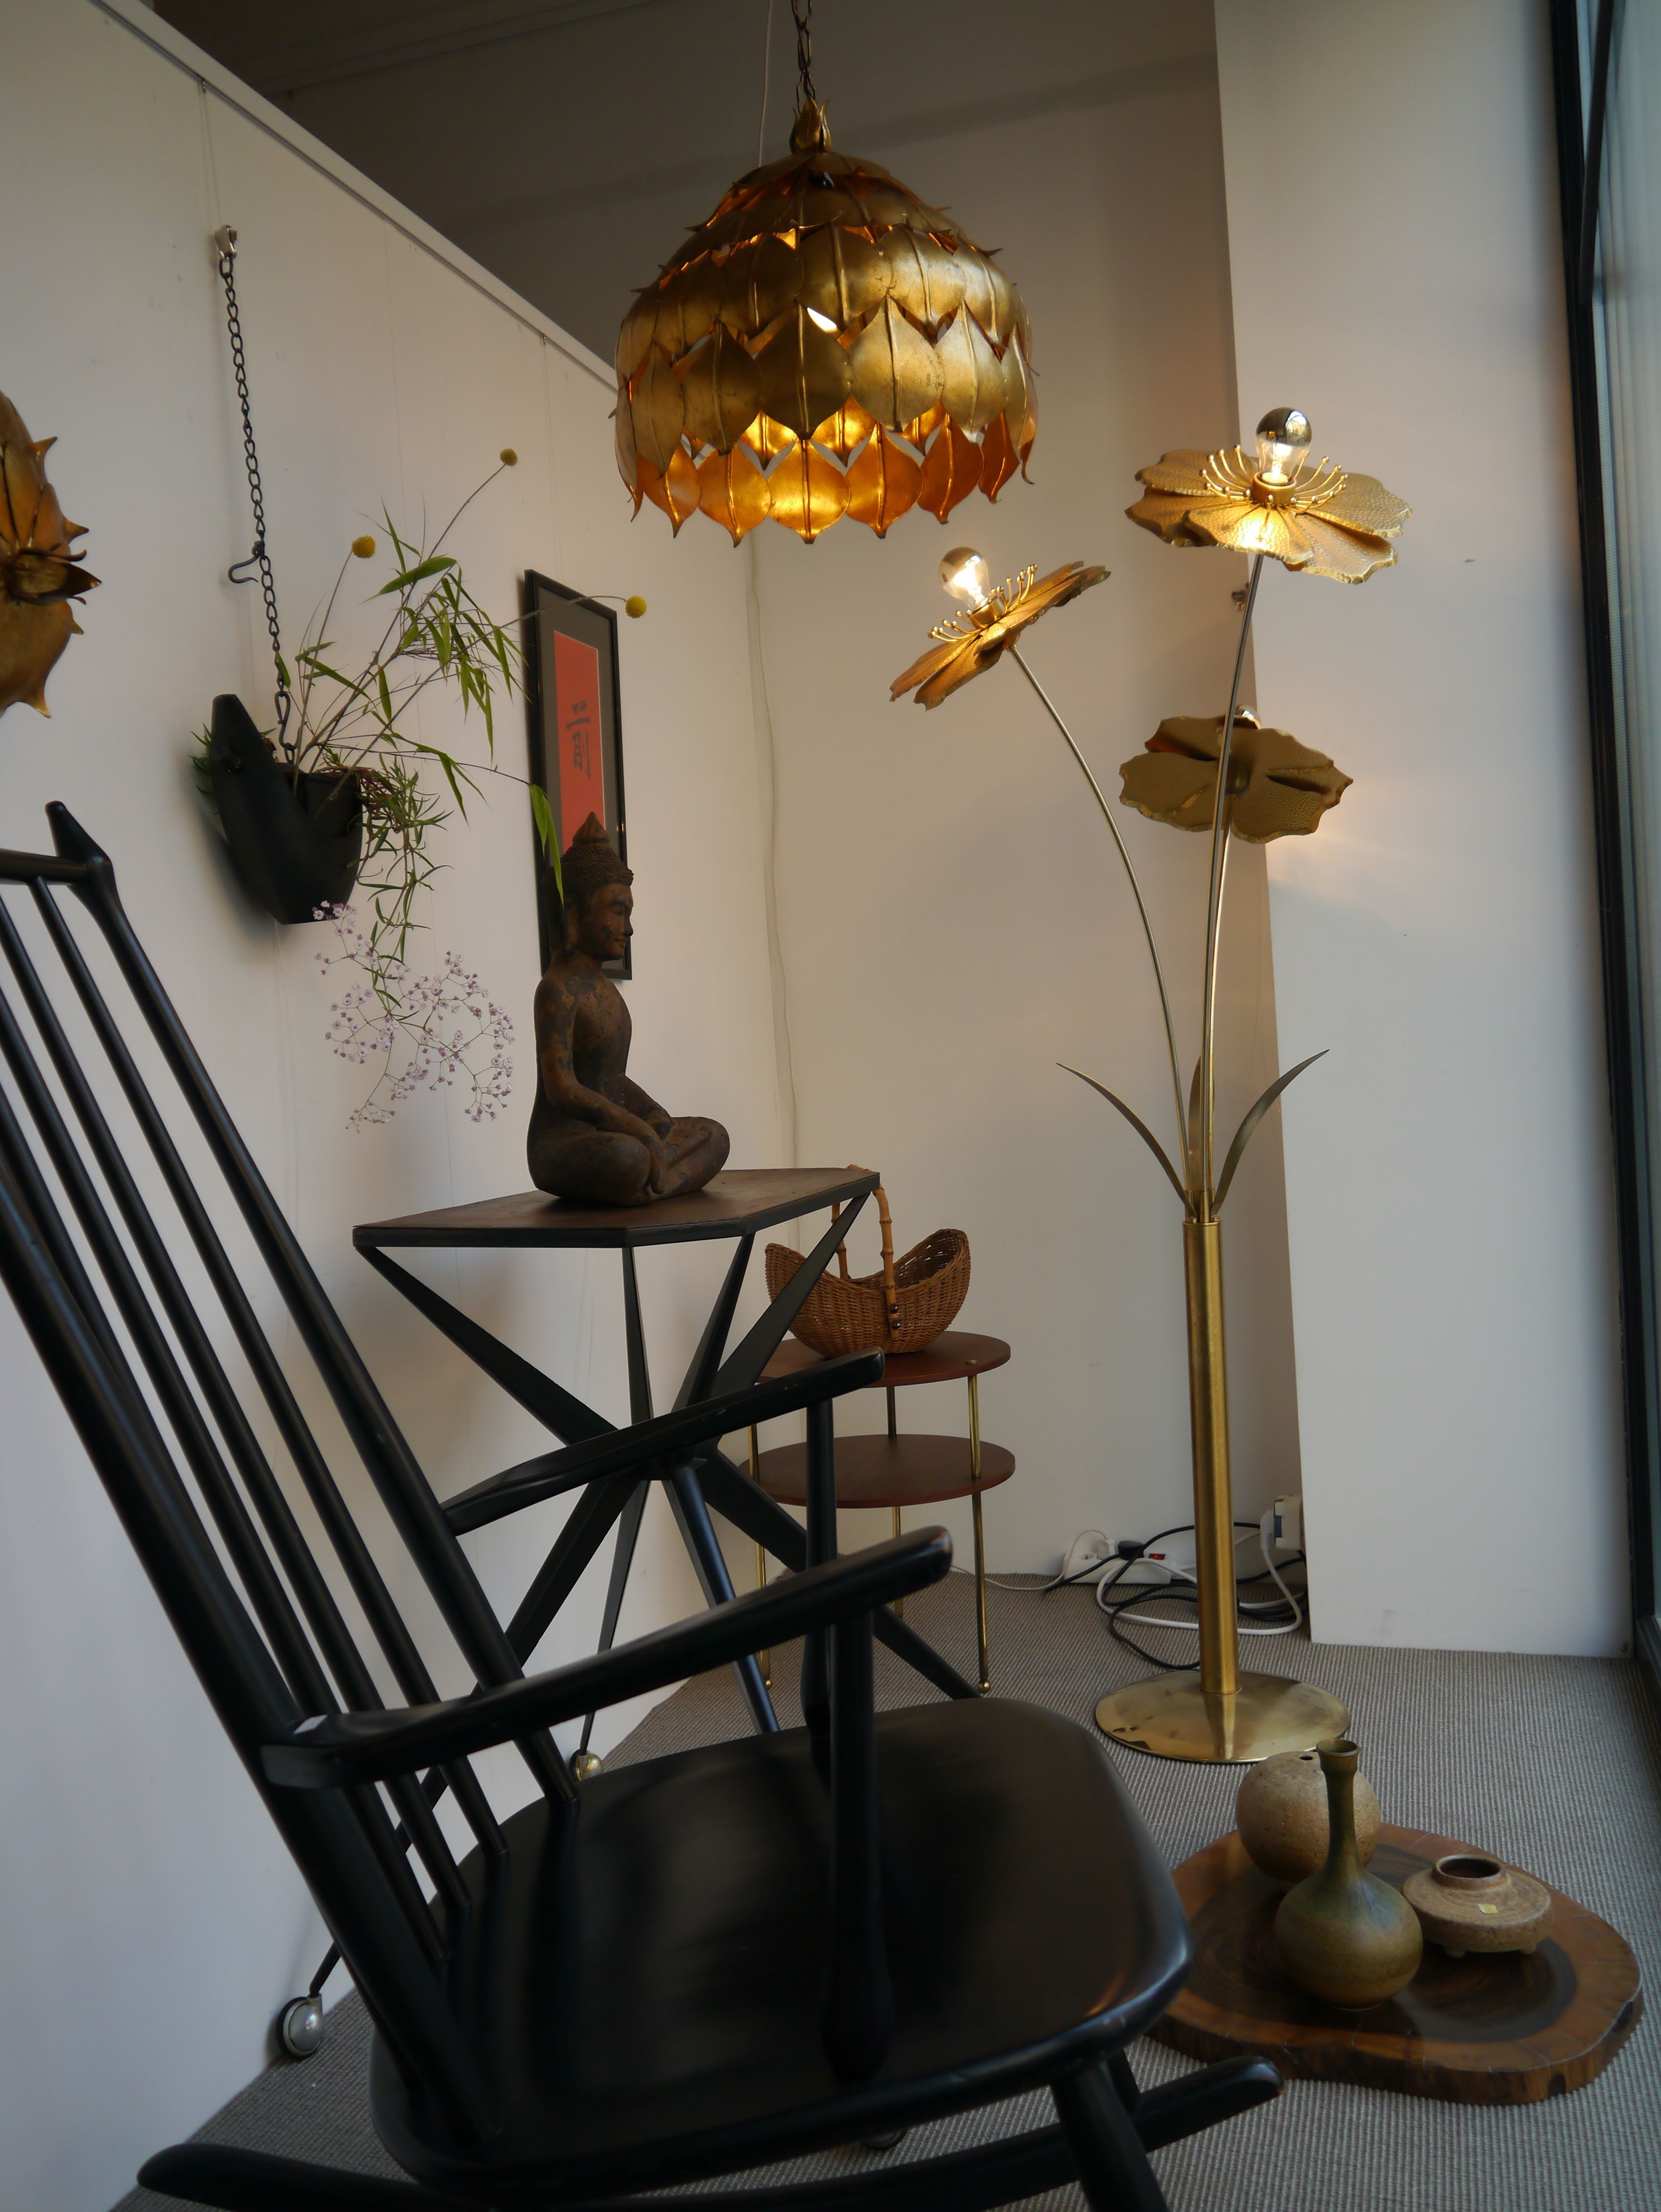 Window 02 julyfloor lamp with 3 flowers ceiling copper lamp lotus floor lamp with 3 flowers ceiling copper lamp lotus shape izmirmasajfo